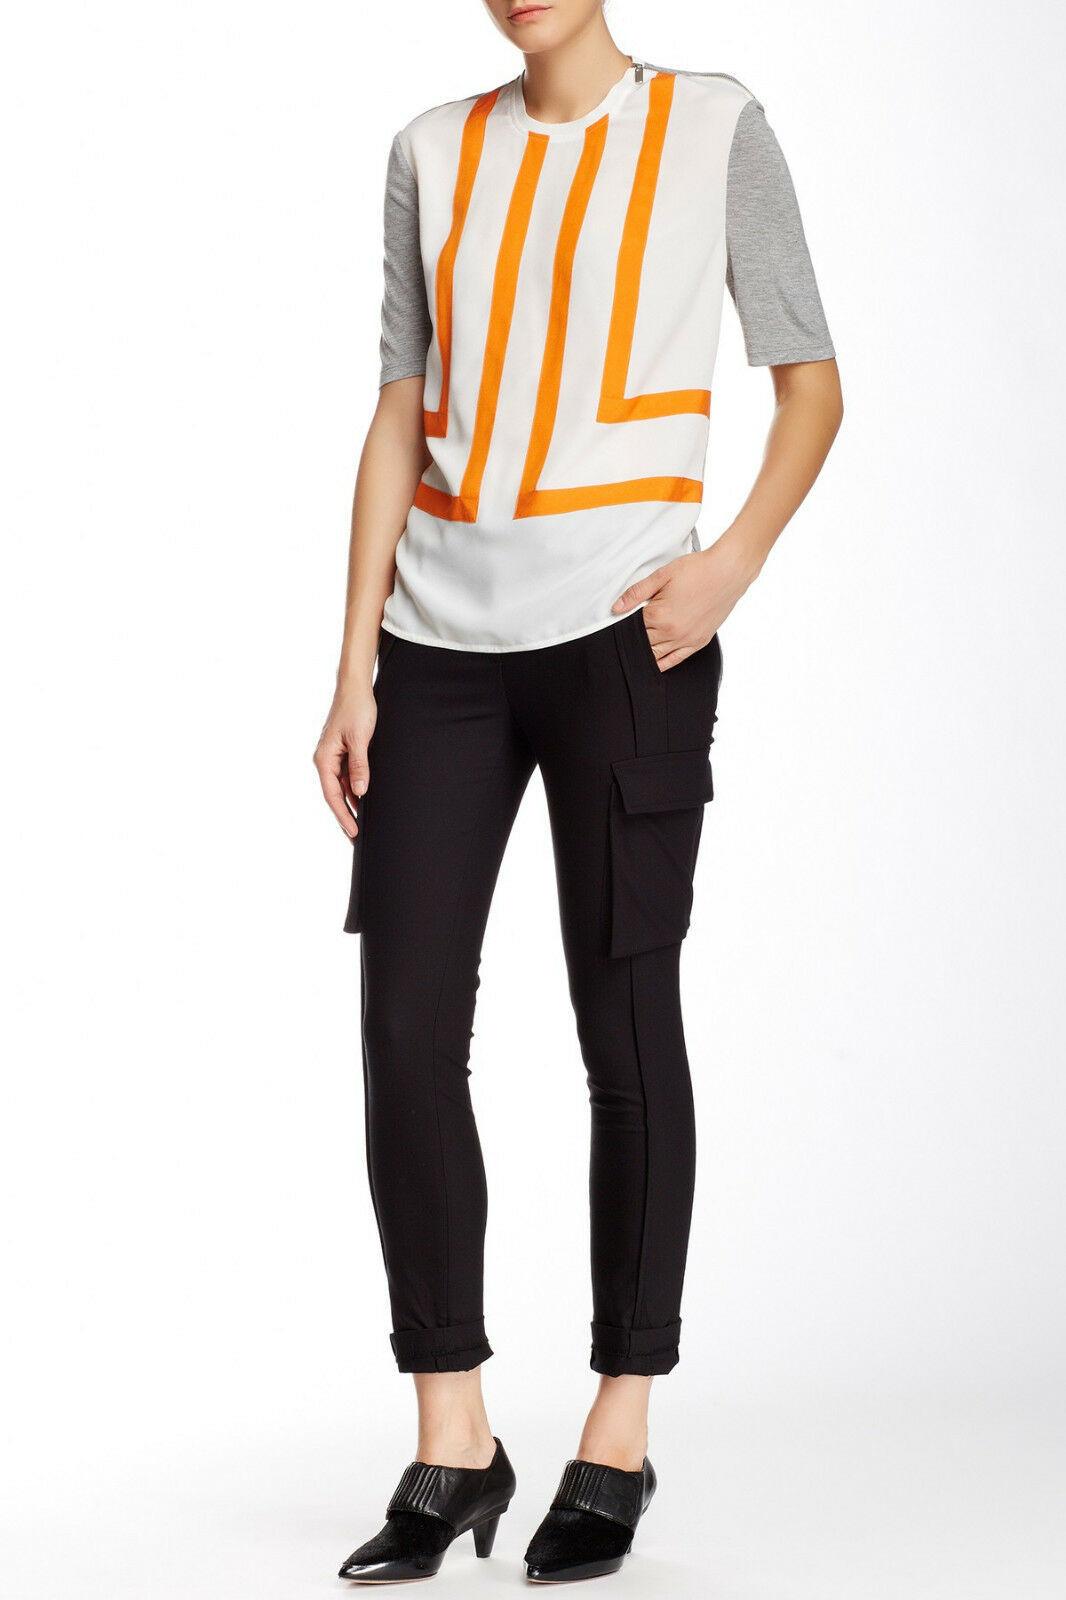 New Womens Designer NWT LAMB Gwen Stefani Cargo Pants Stretch Skinny 6 Black